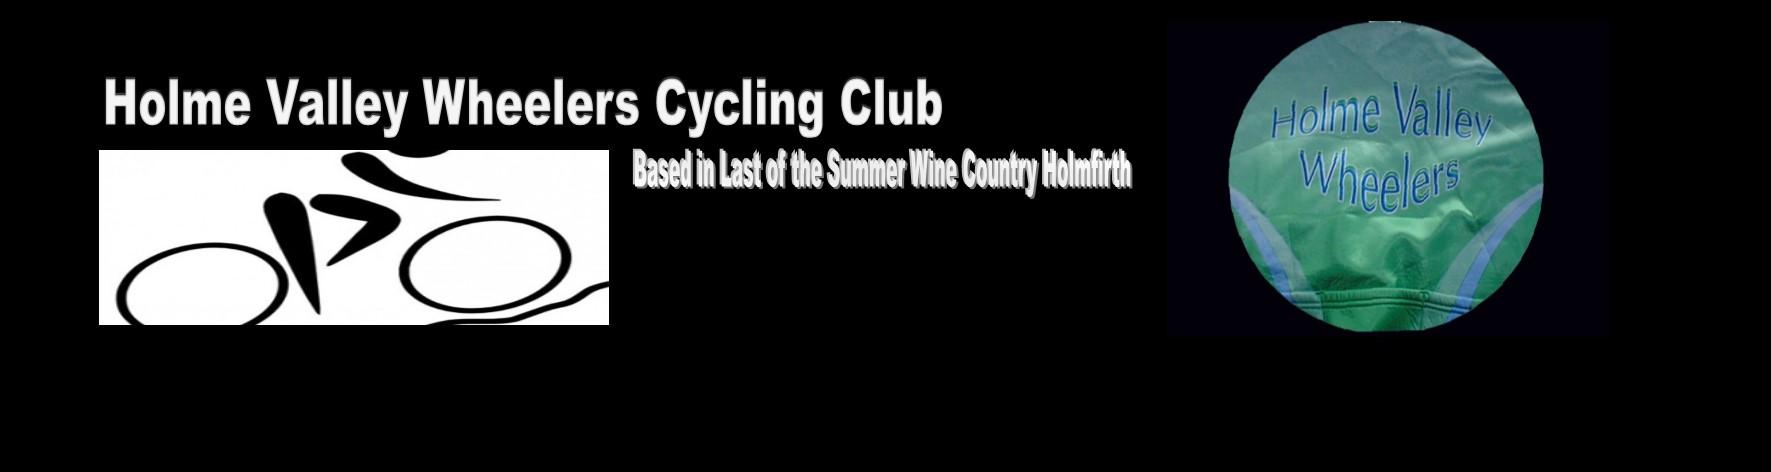 Holme Valley Wheelers Cycling Club